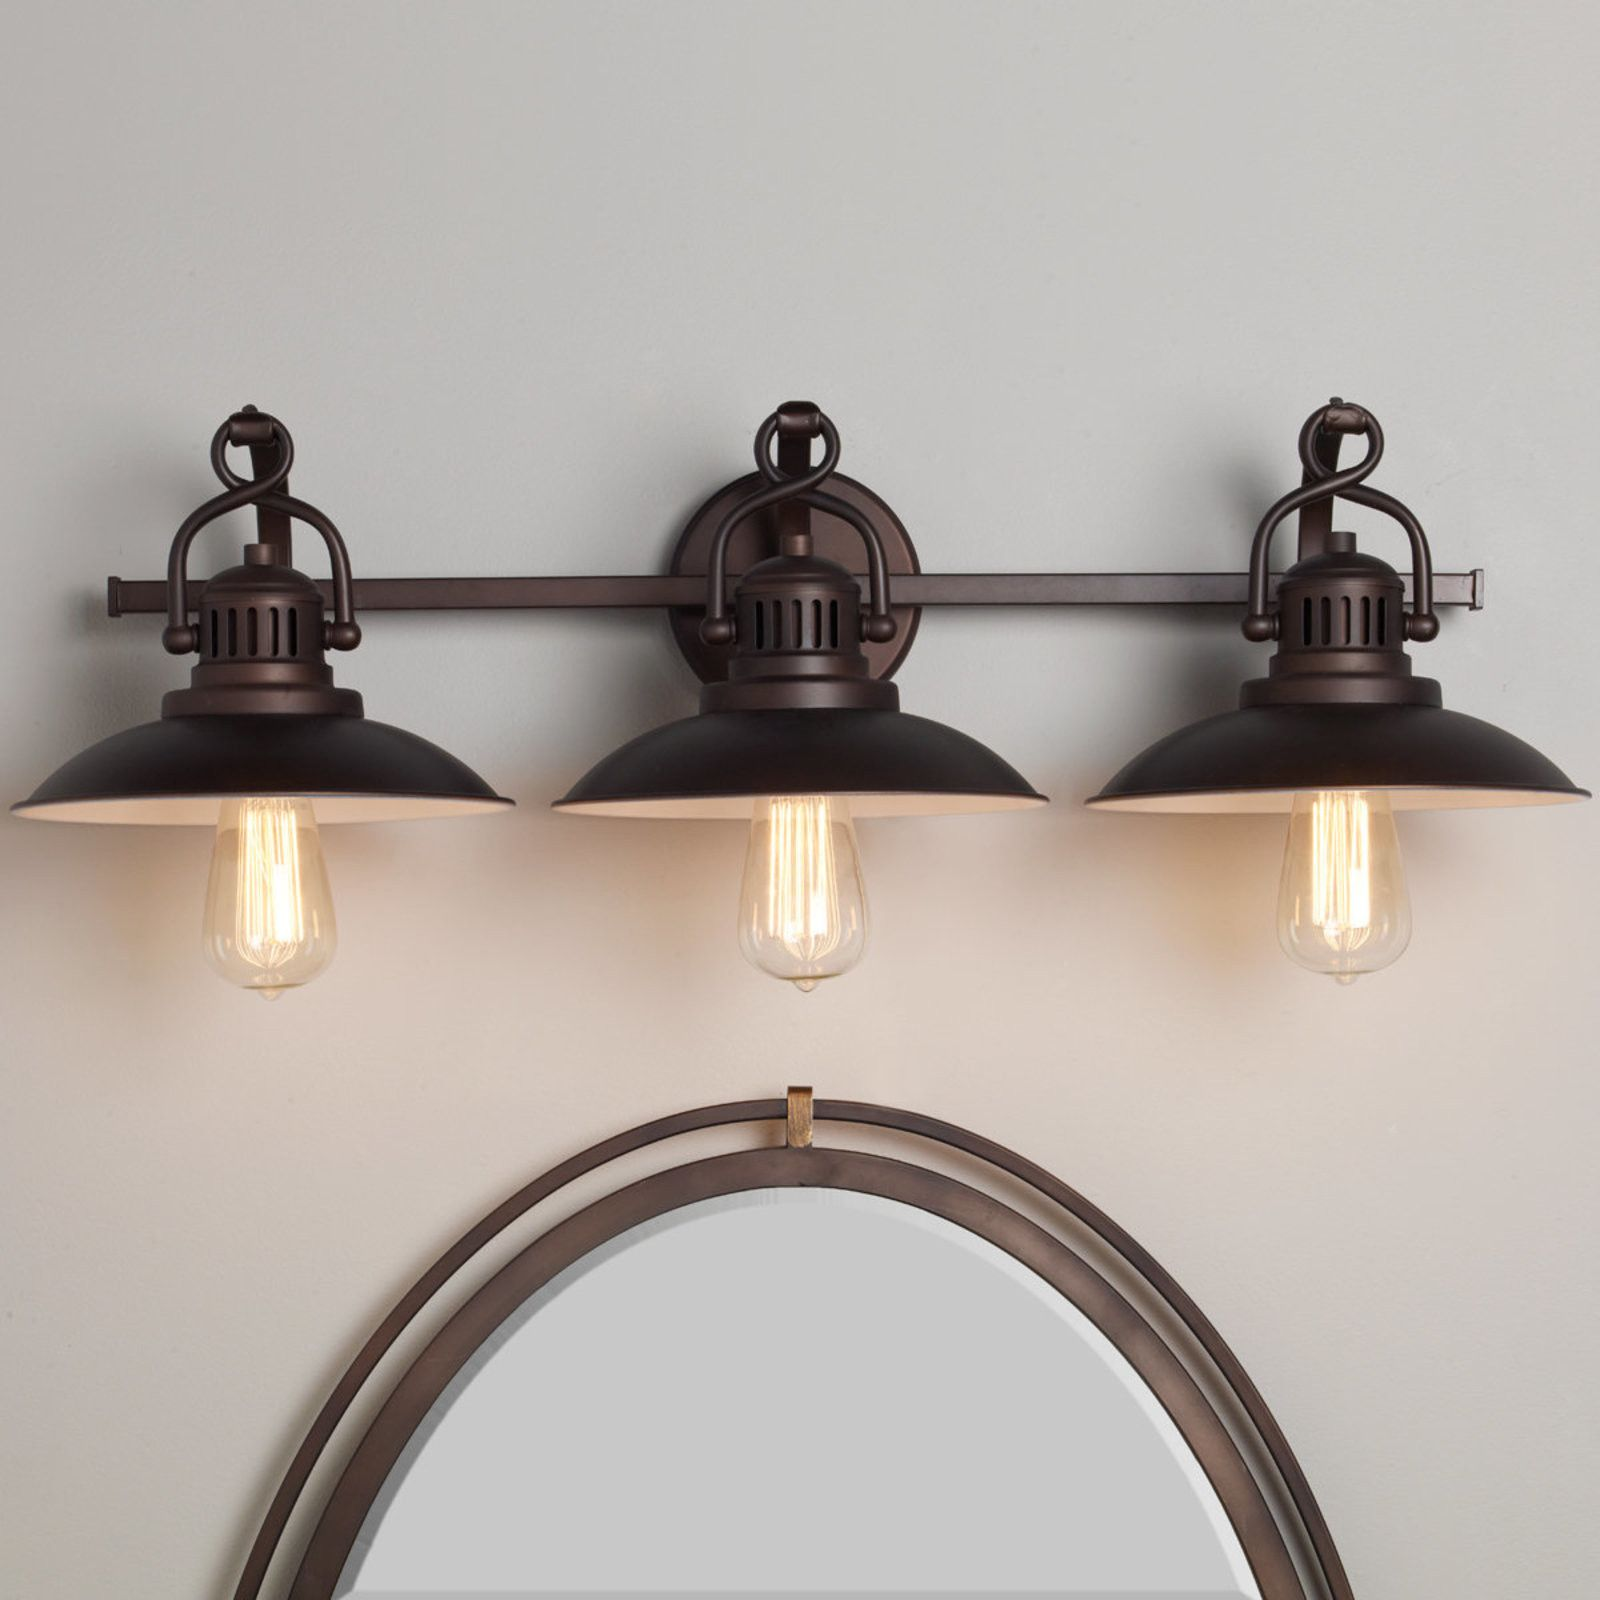 Nautical Bathroom Vanity Lights Station Lantern Bath Light 3 Light Shades Of Light Farmhouse Bathroom Light Vintage Bathroom Lighting Farmhouse Light Fixtures